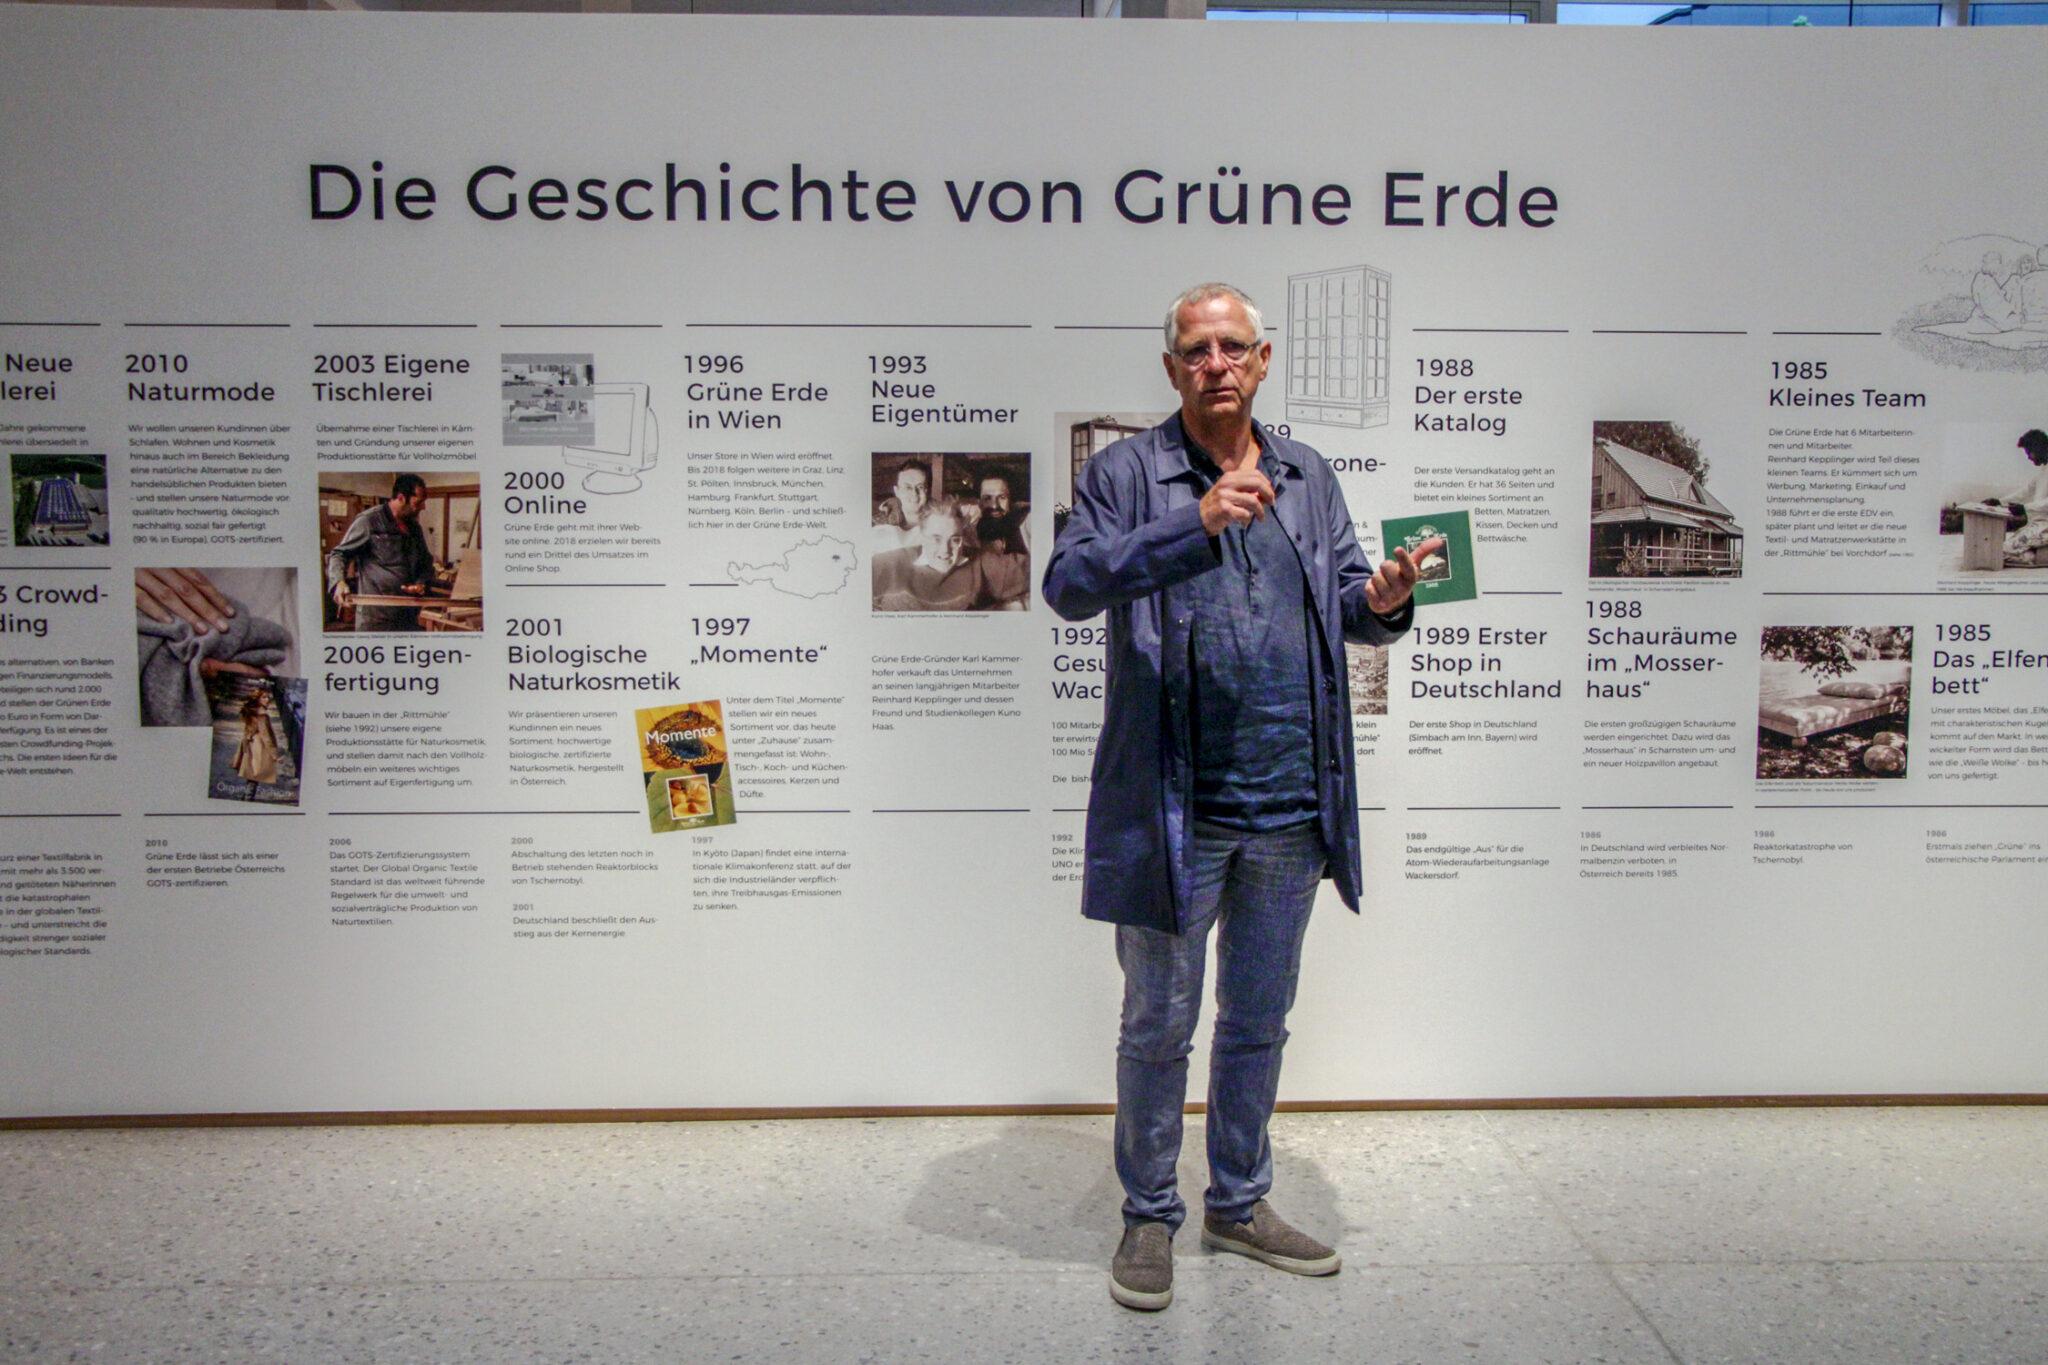 nachhaltiges moebel design salzburg gruene erde welt blogger besuch